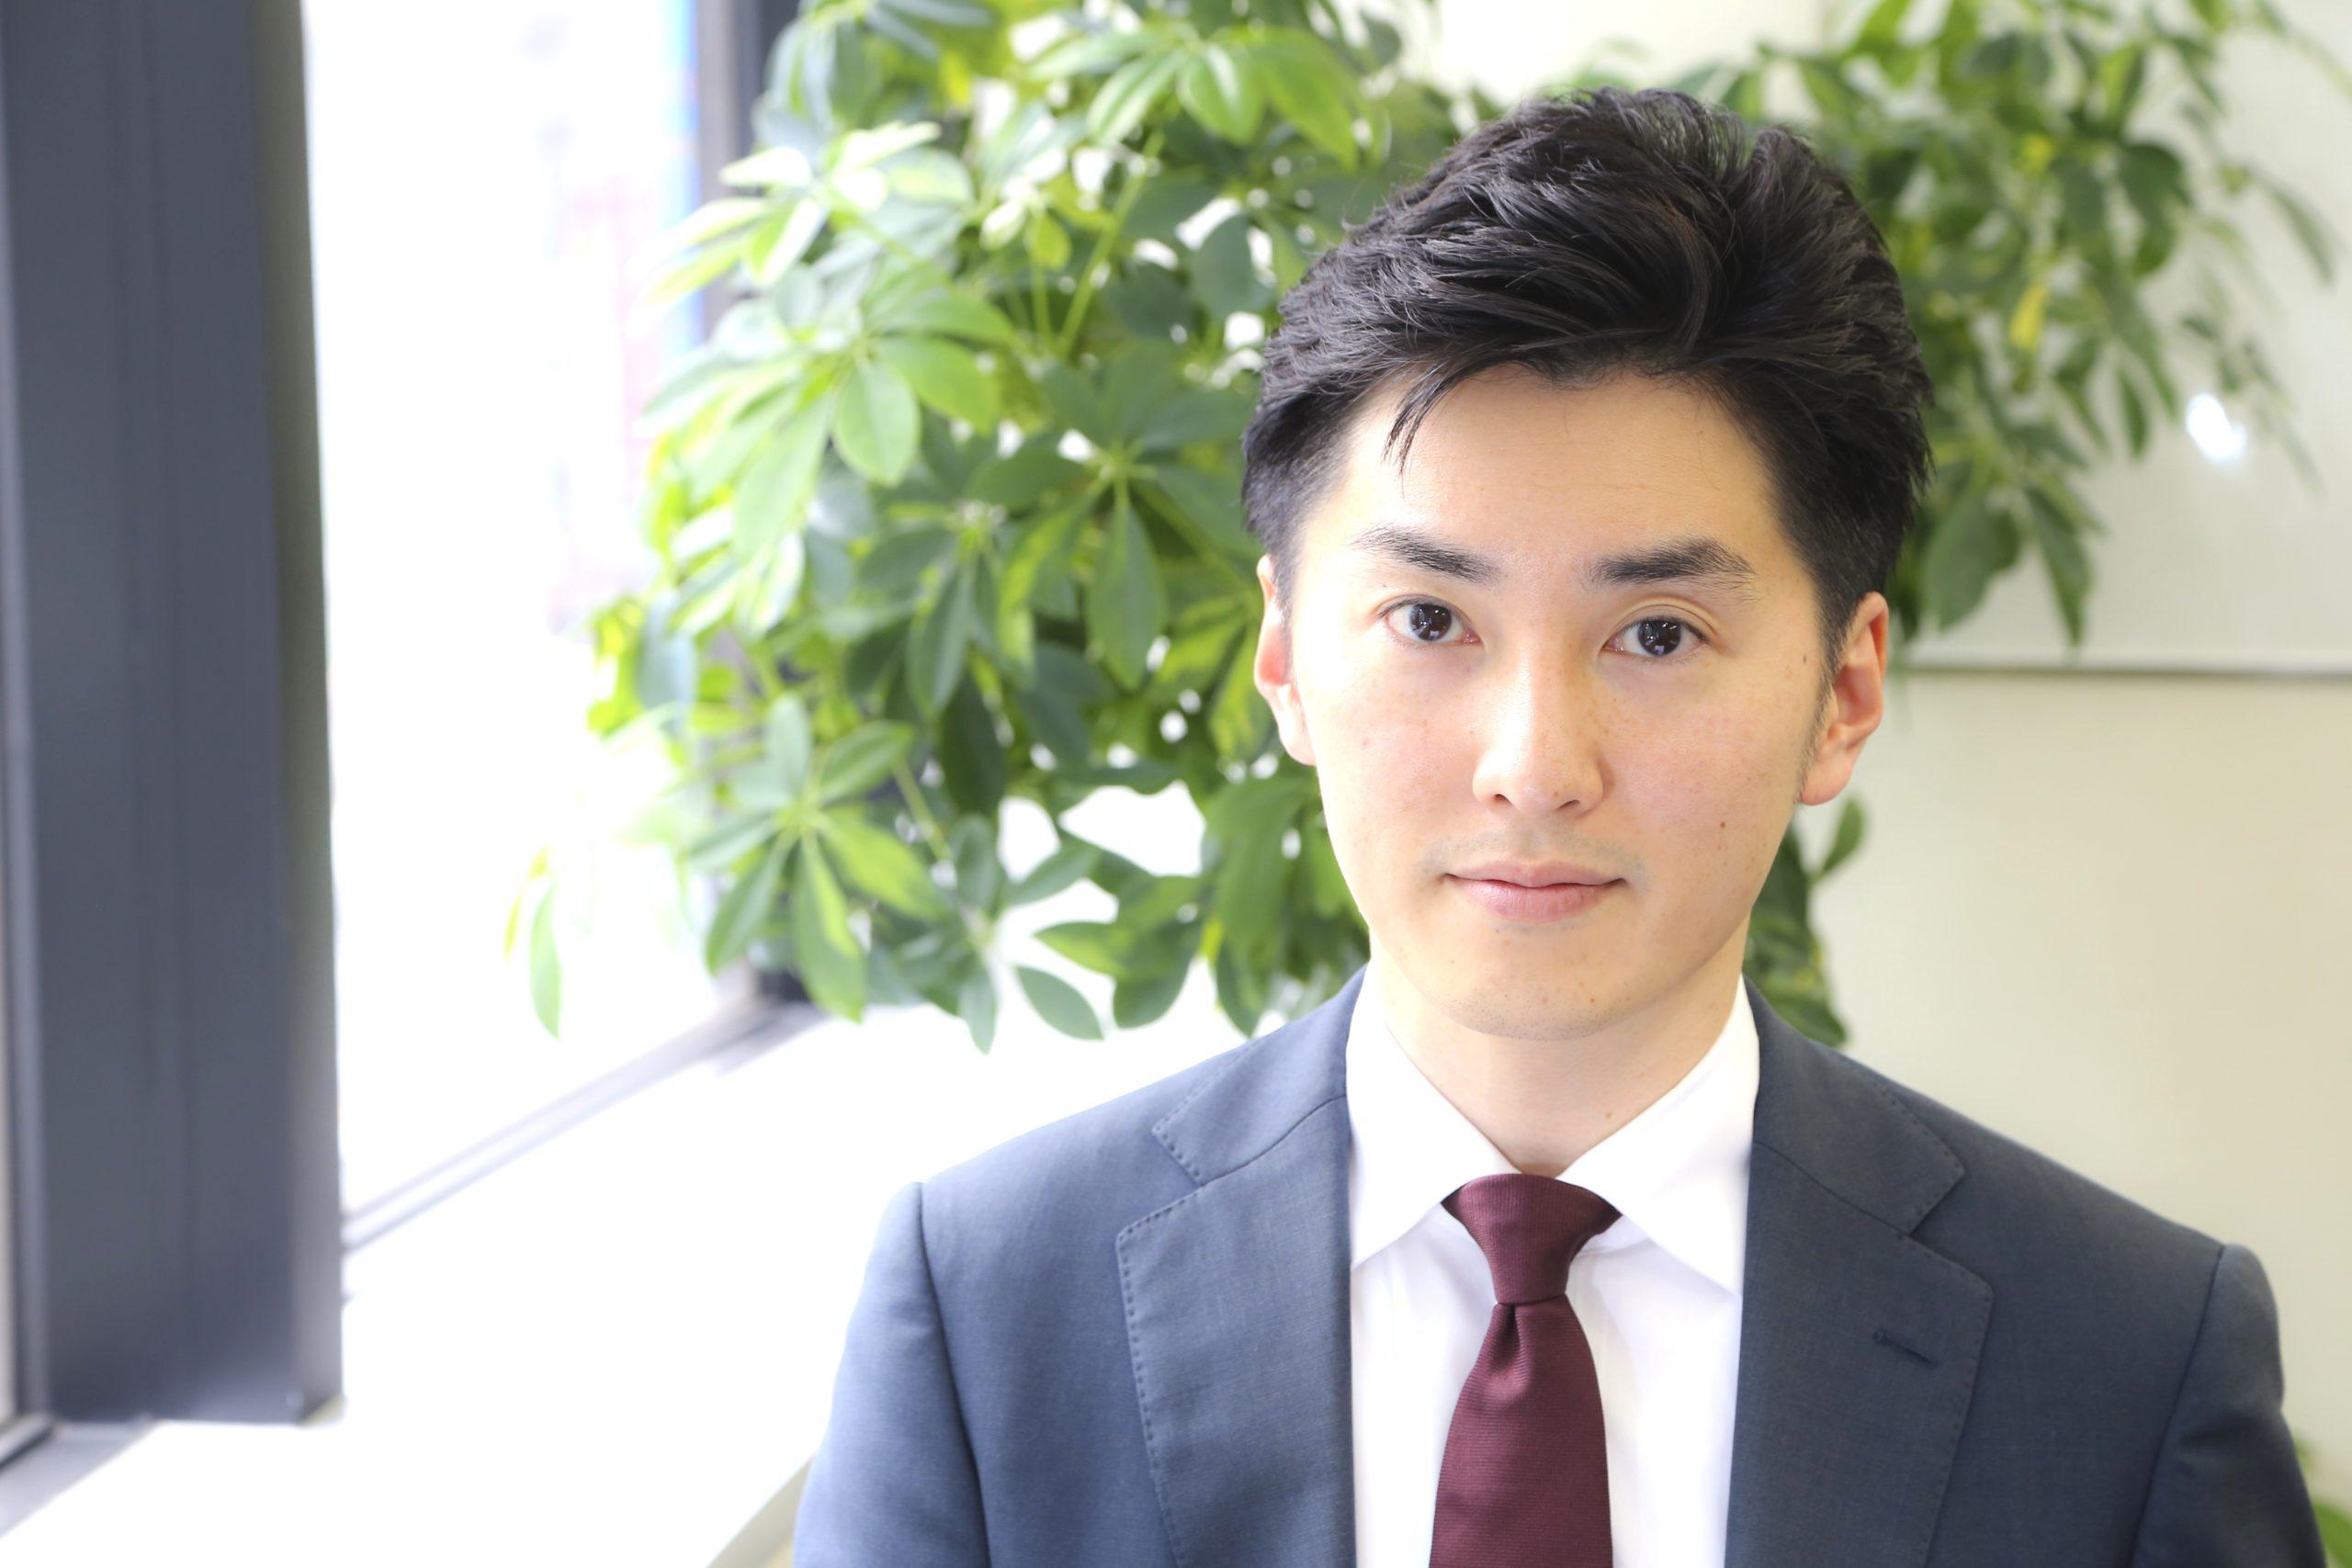 会計税務スタッフ(公認会計士・内資顧客)